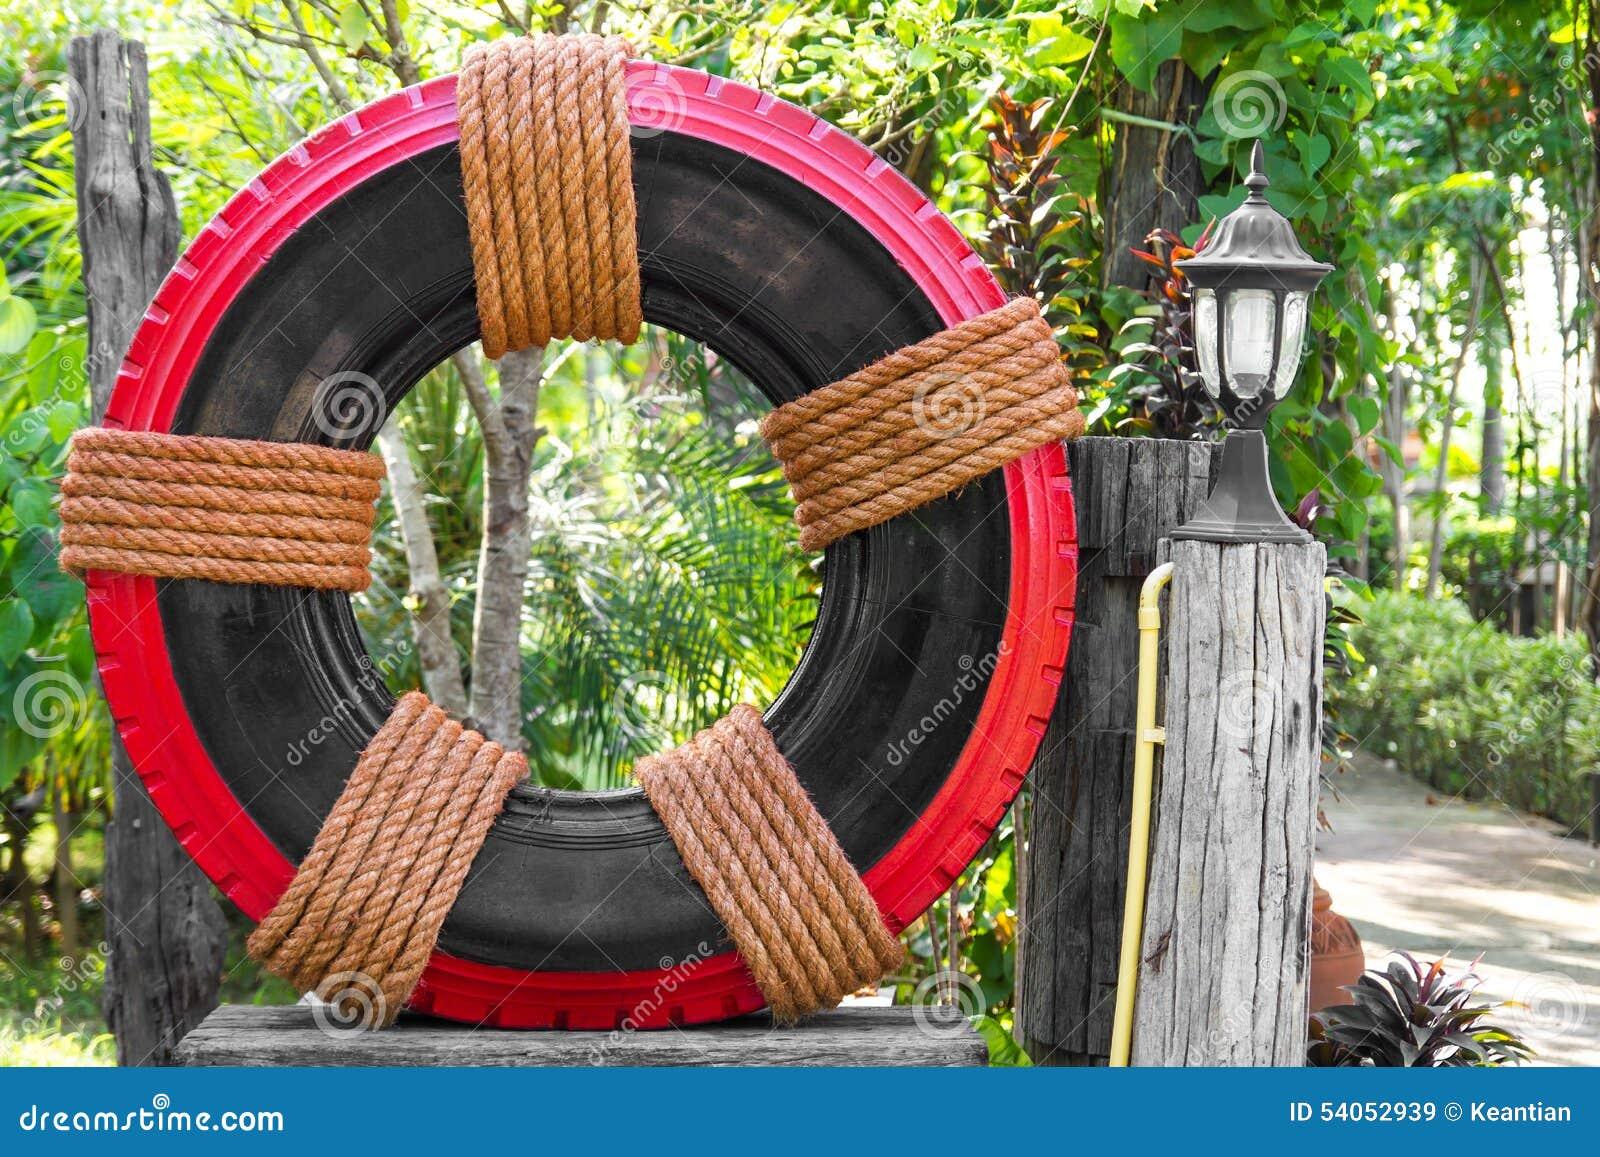 d cor de jardin de pneu photo stock image 54052939. Black Bedroom Furniture Sets. Home Design Ideas